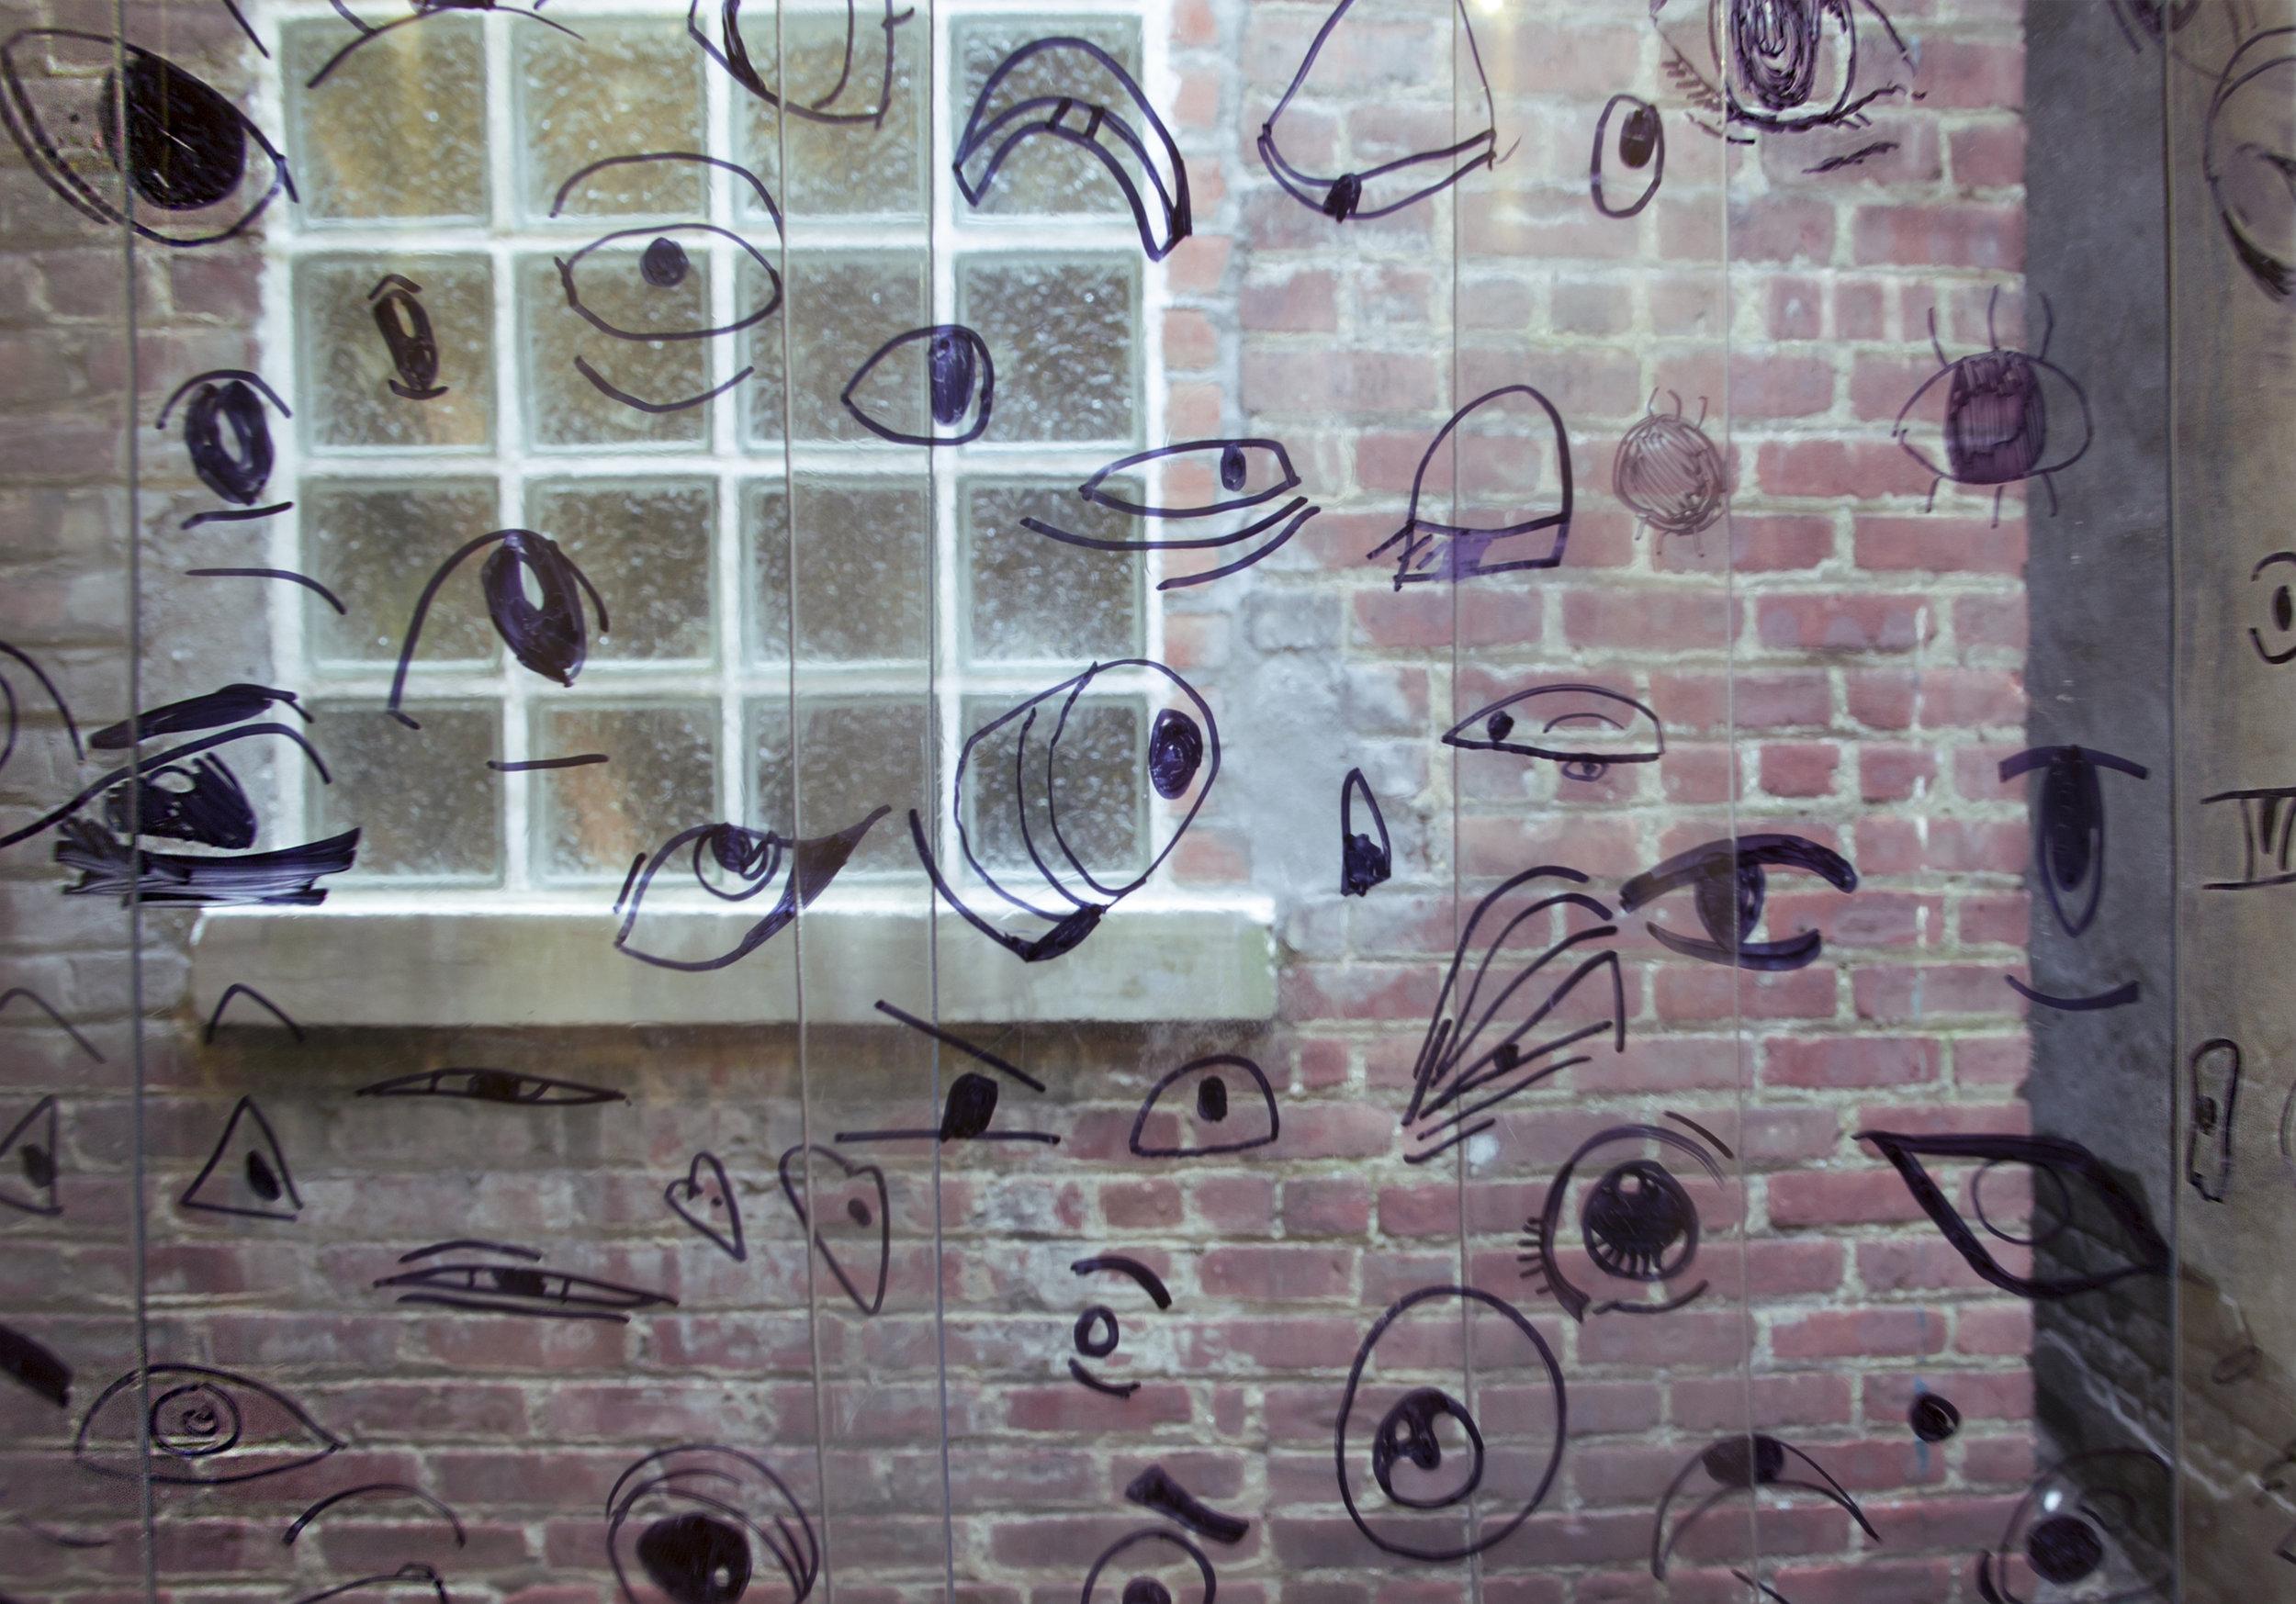 Mika Agari   Pearl Onions and Black Eyed Peas    2017  Plastic industrial door curtain, collected ink drawings of eyes, steel hardware